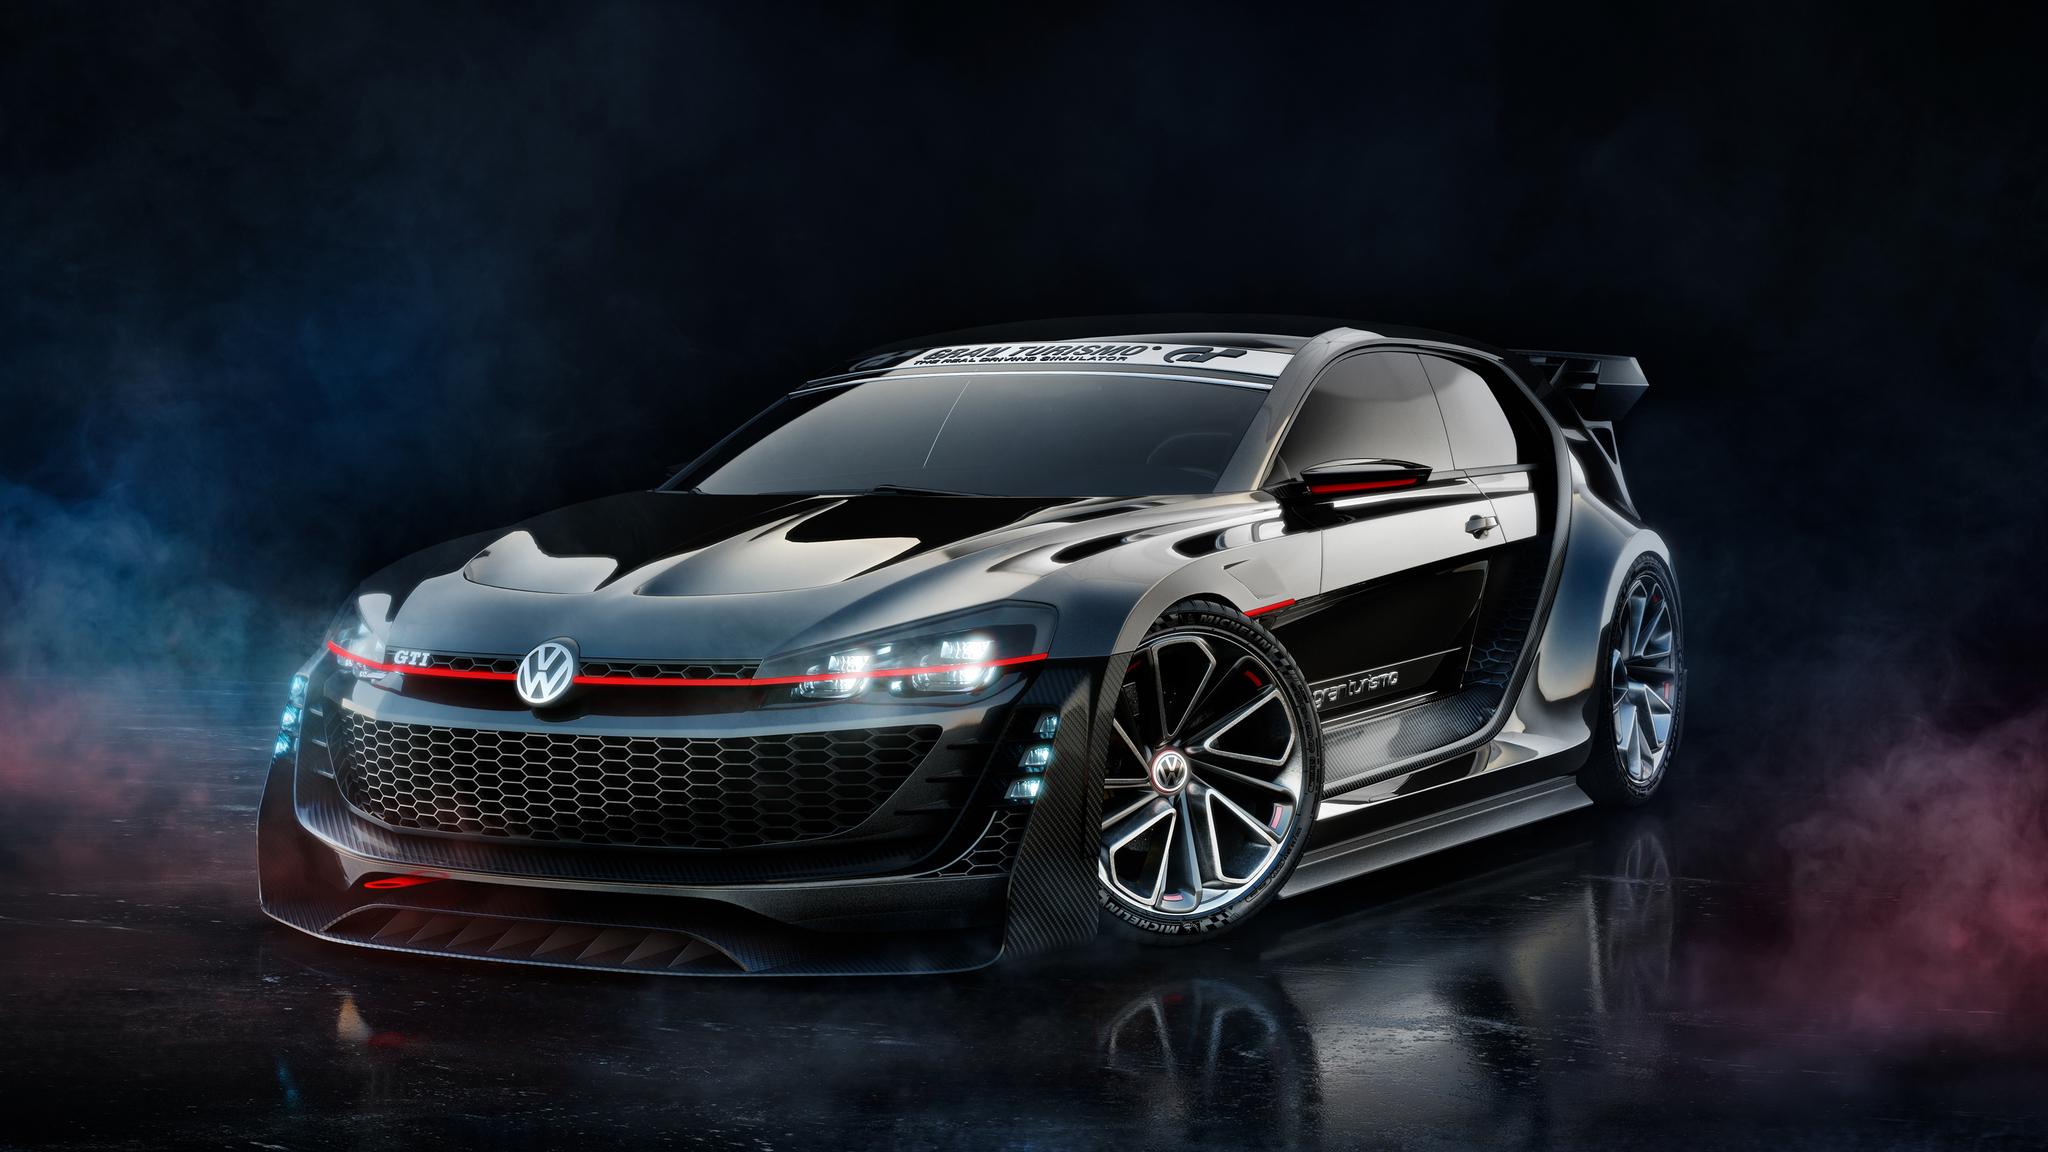 2048x1152 Volkswagen Gti Gran Turismo 4k 2048x1152 Resolution Hd 4k